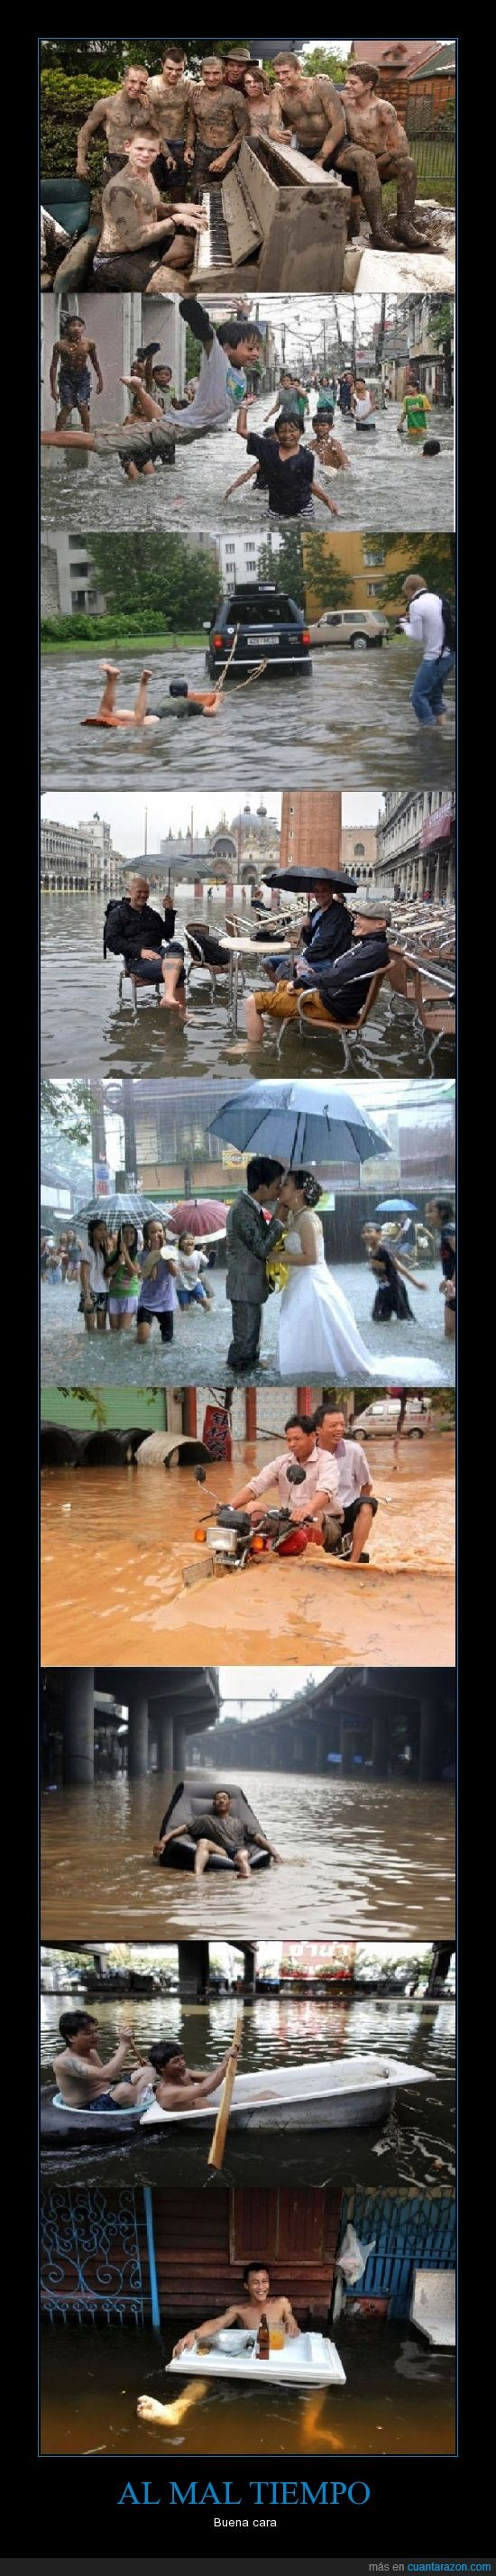 agua mojada,camioneta,chinos?,felices,inundacion,lluvia,mal tiempo,mas lluvia